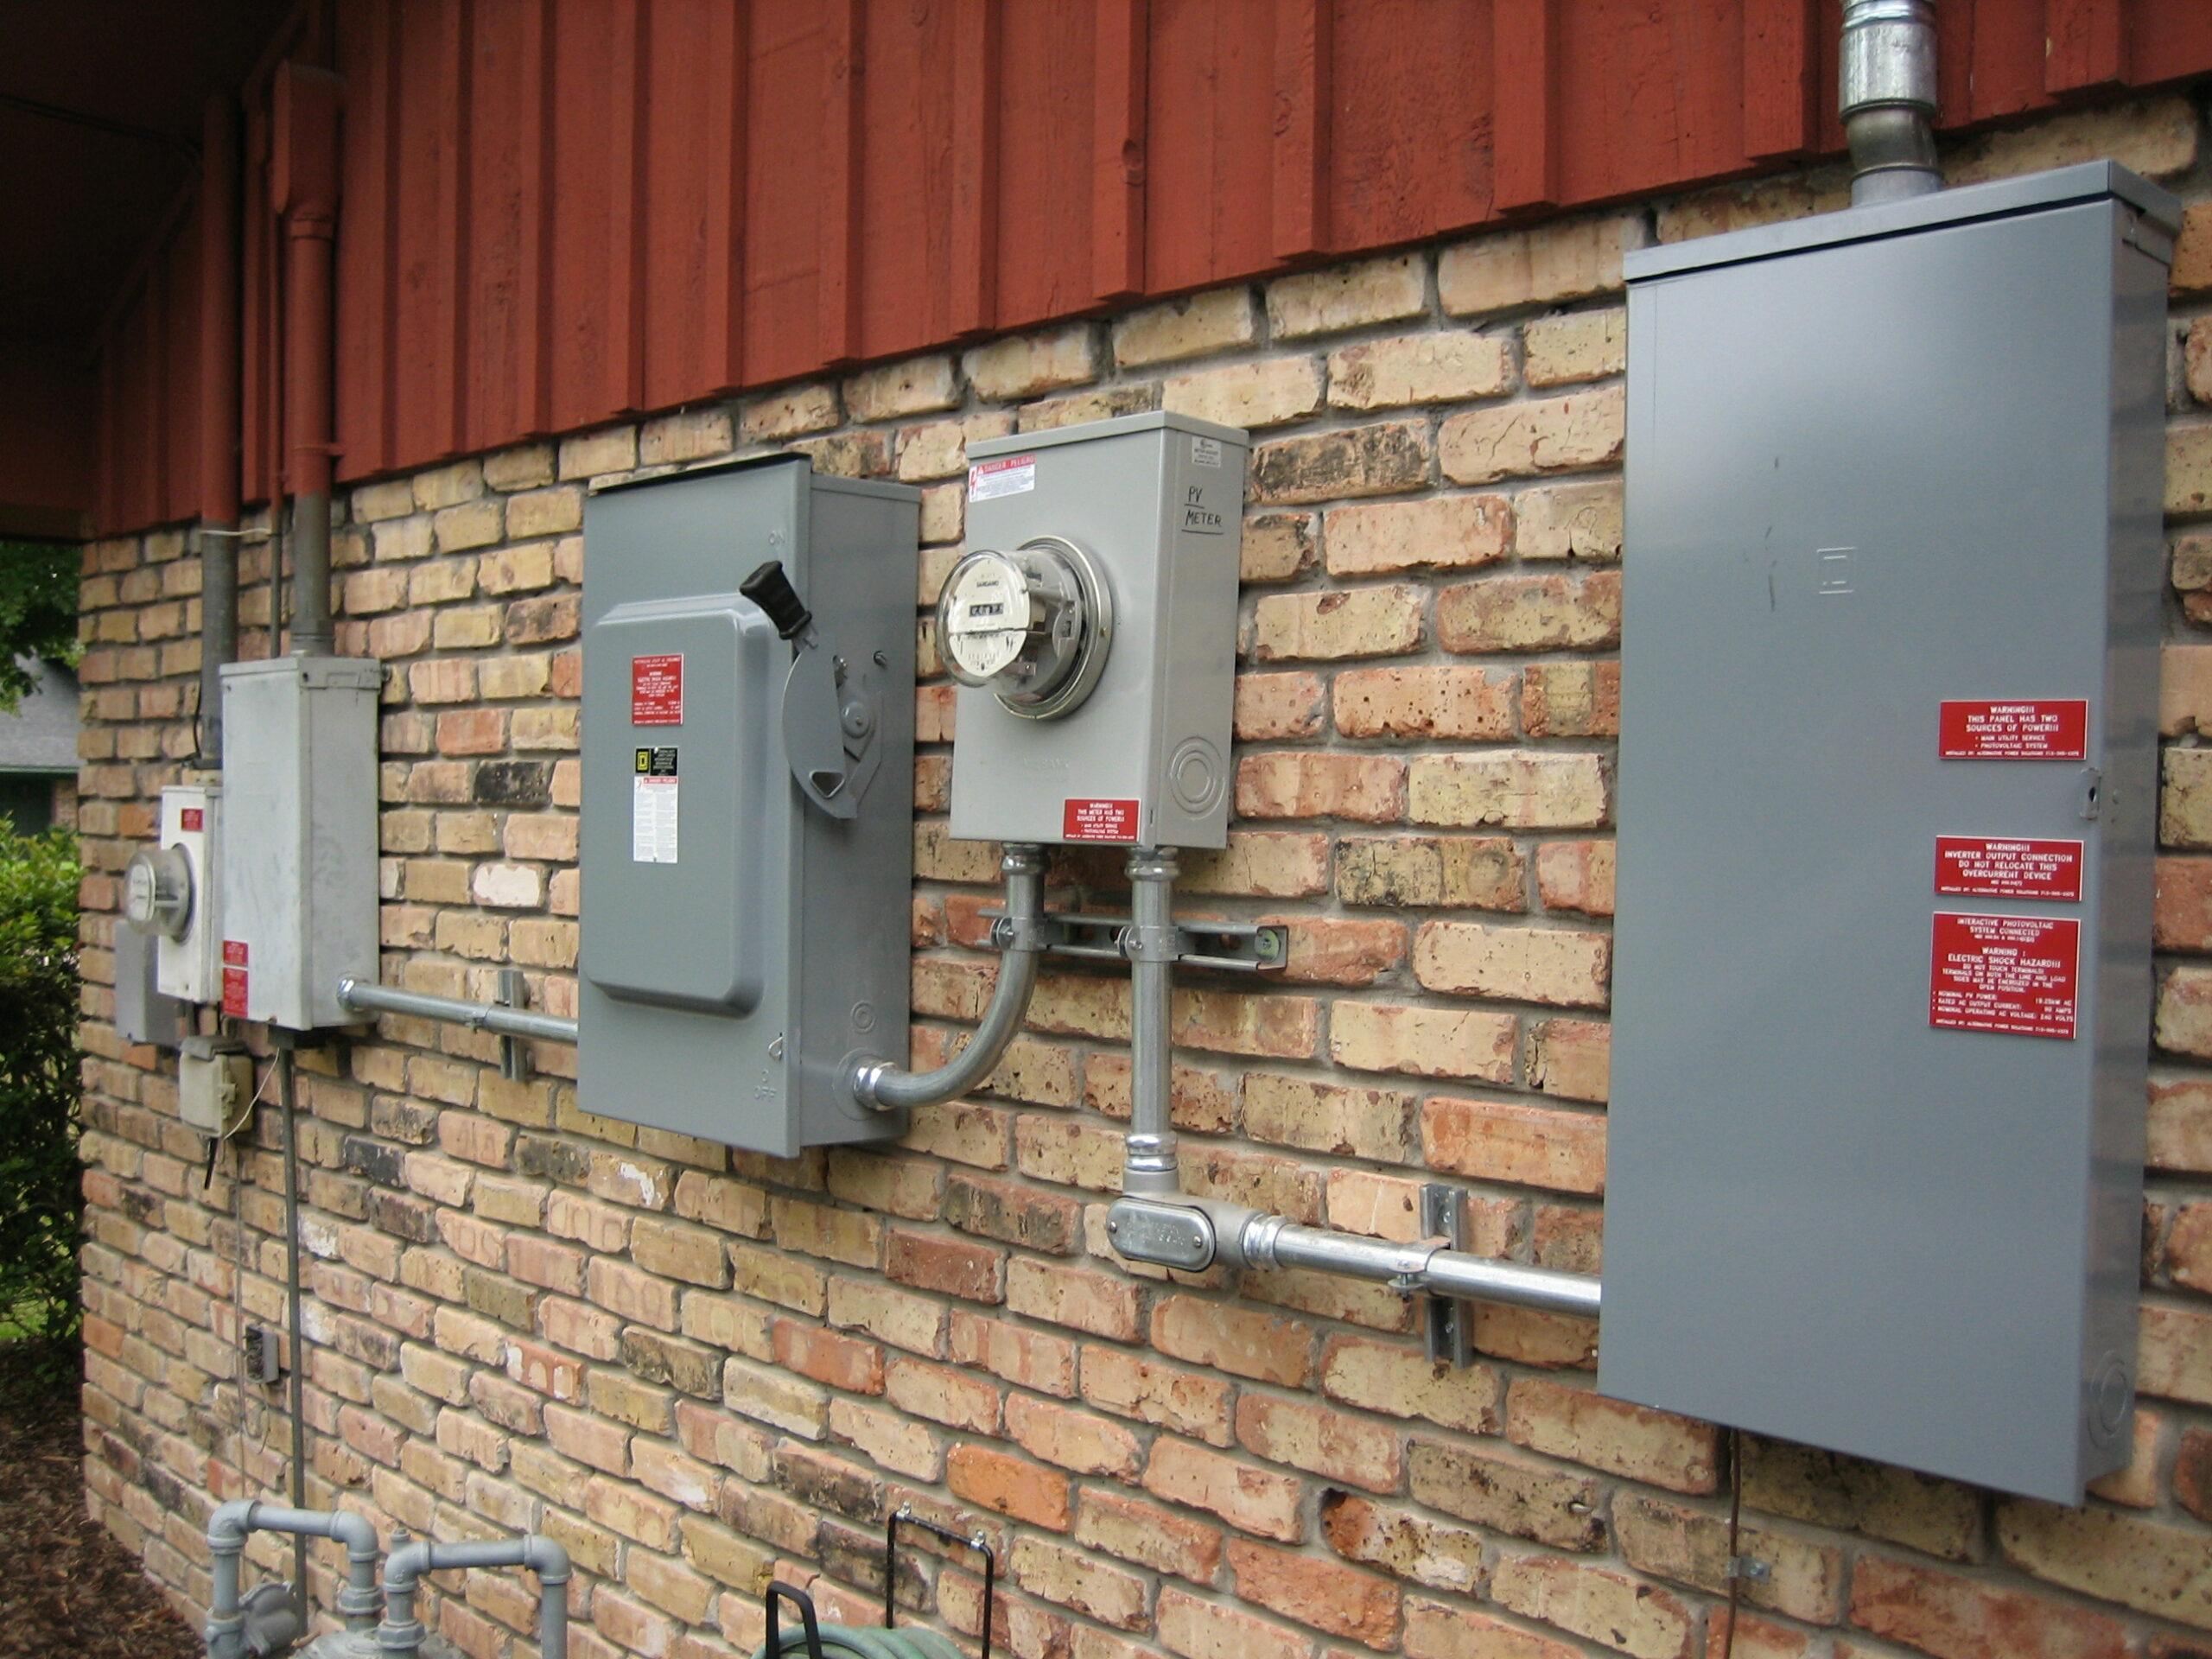 Solar panel meters